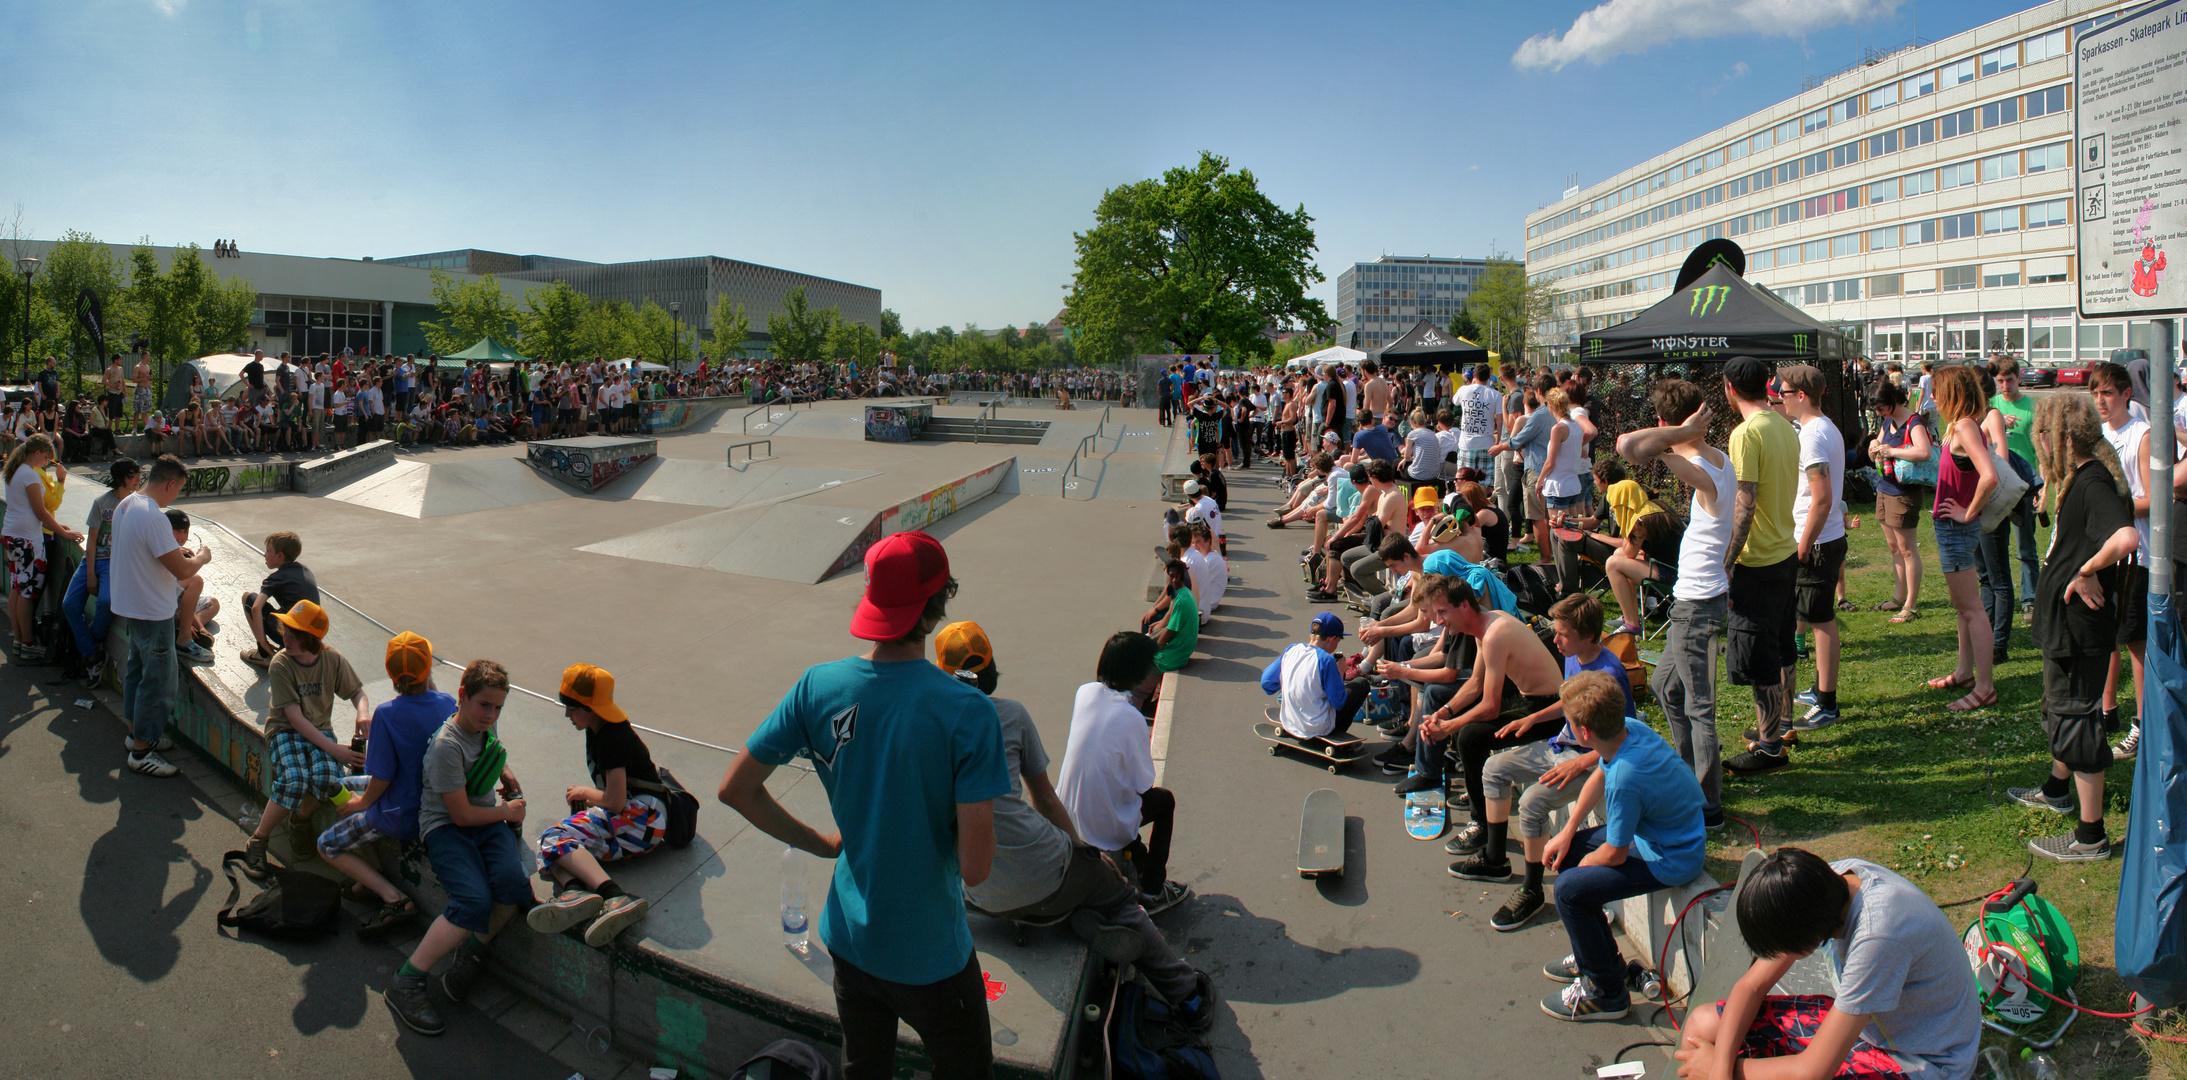 Skateboard-Contest in Dresden (01.05.2012)